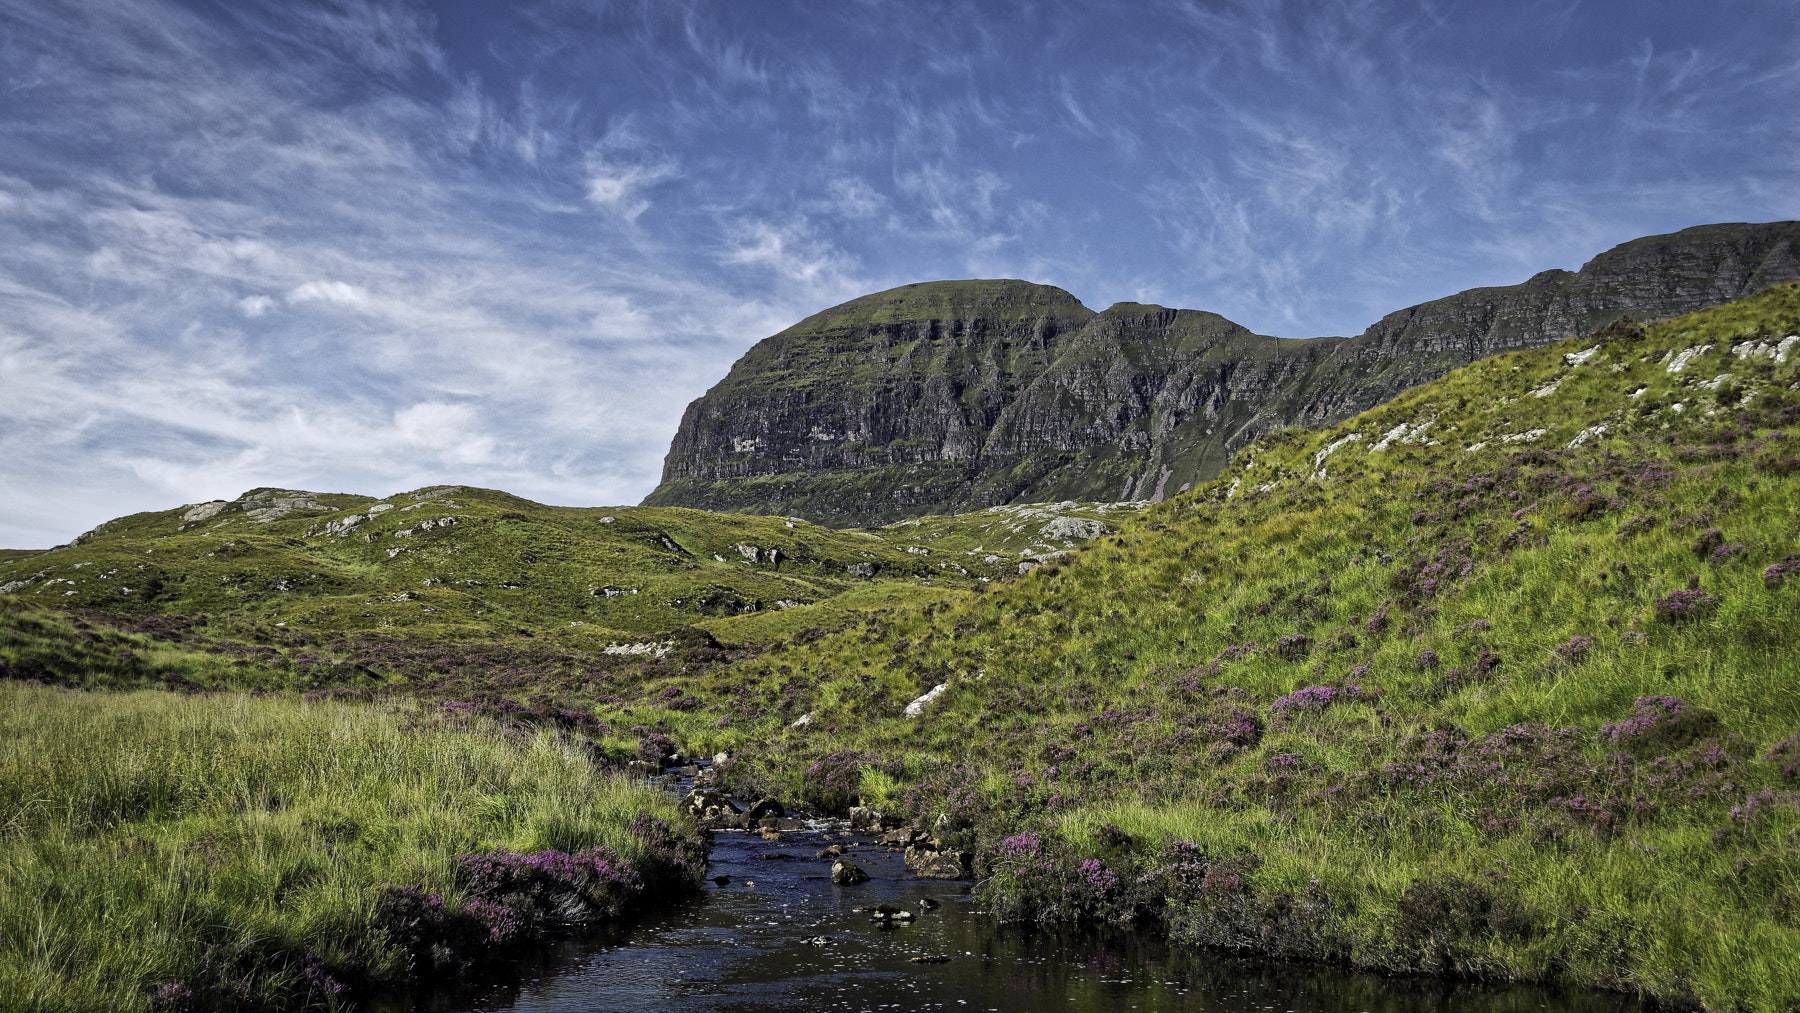 Uidh Fhearna River between Loch Veyatie and Fionn Loch